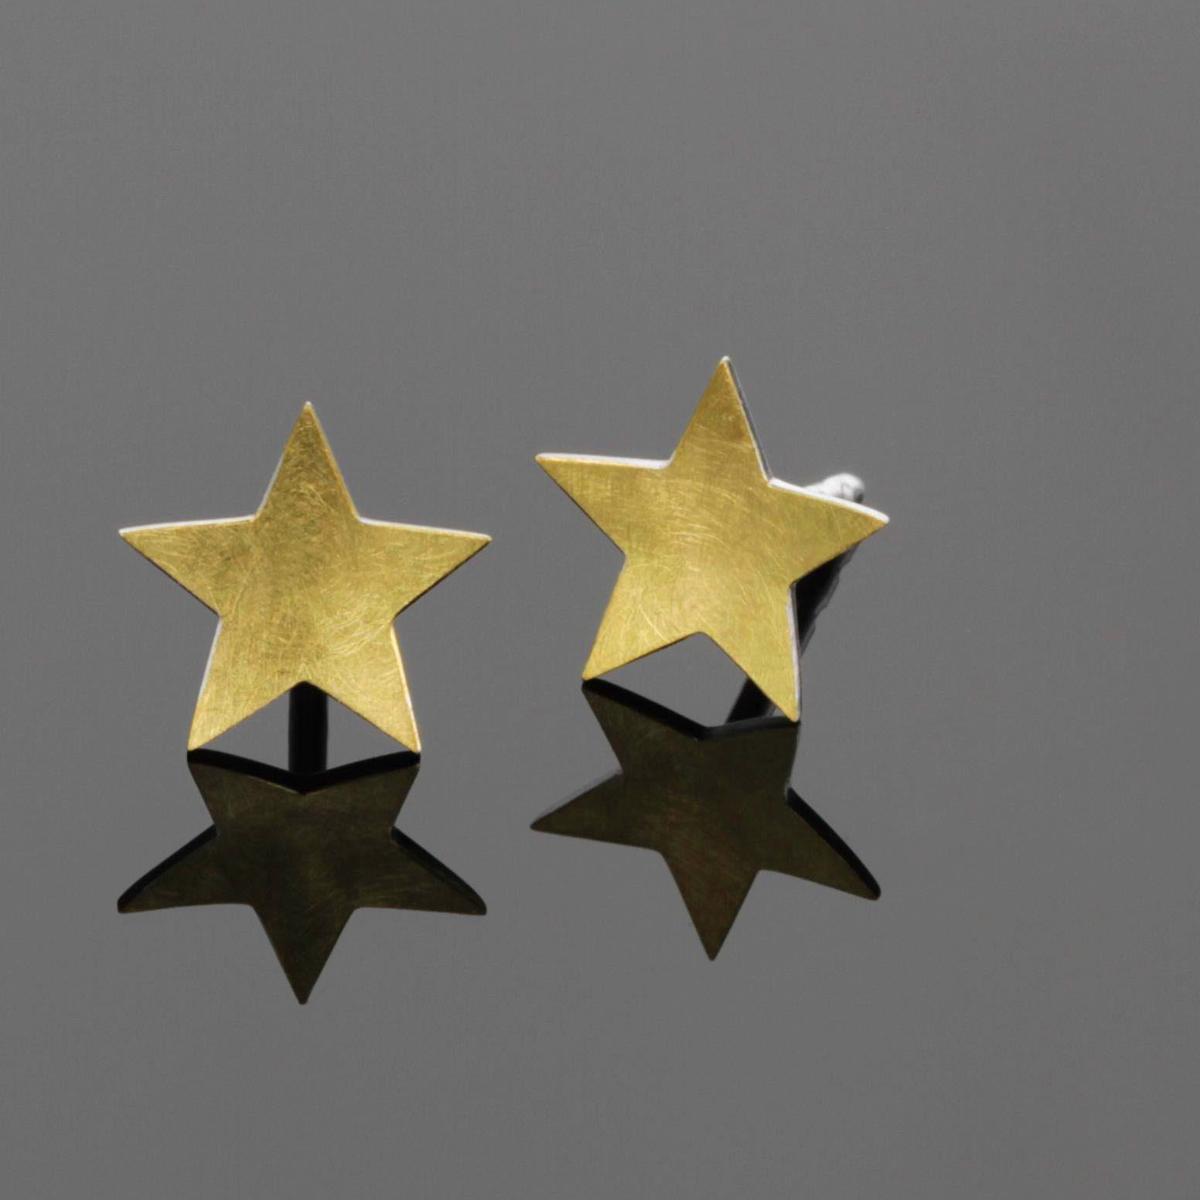 Star earrings Mauritius